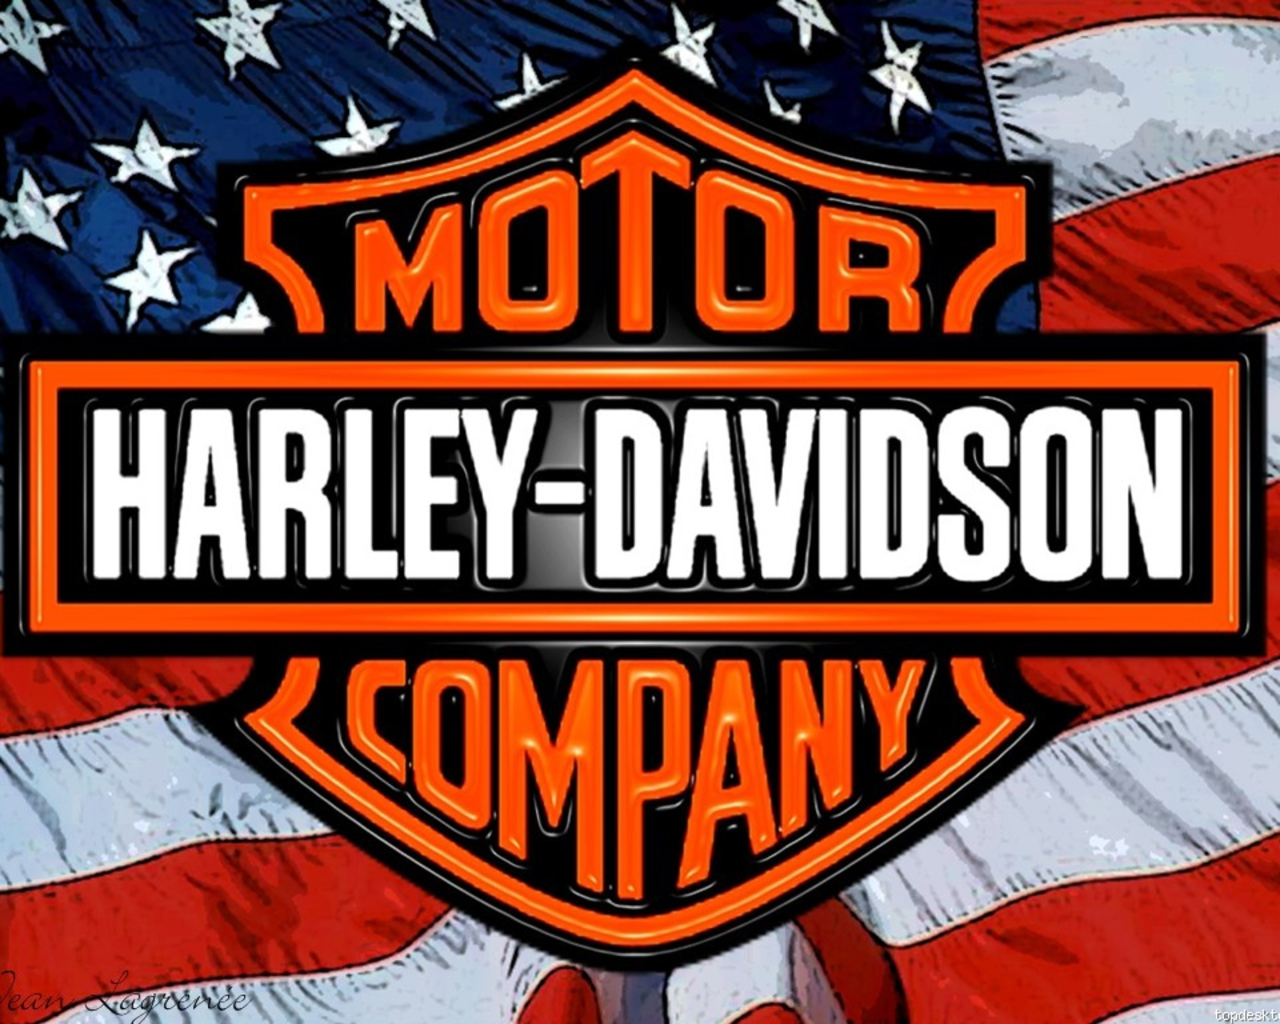 Harley davidson symbol Wallpaper